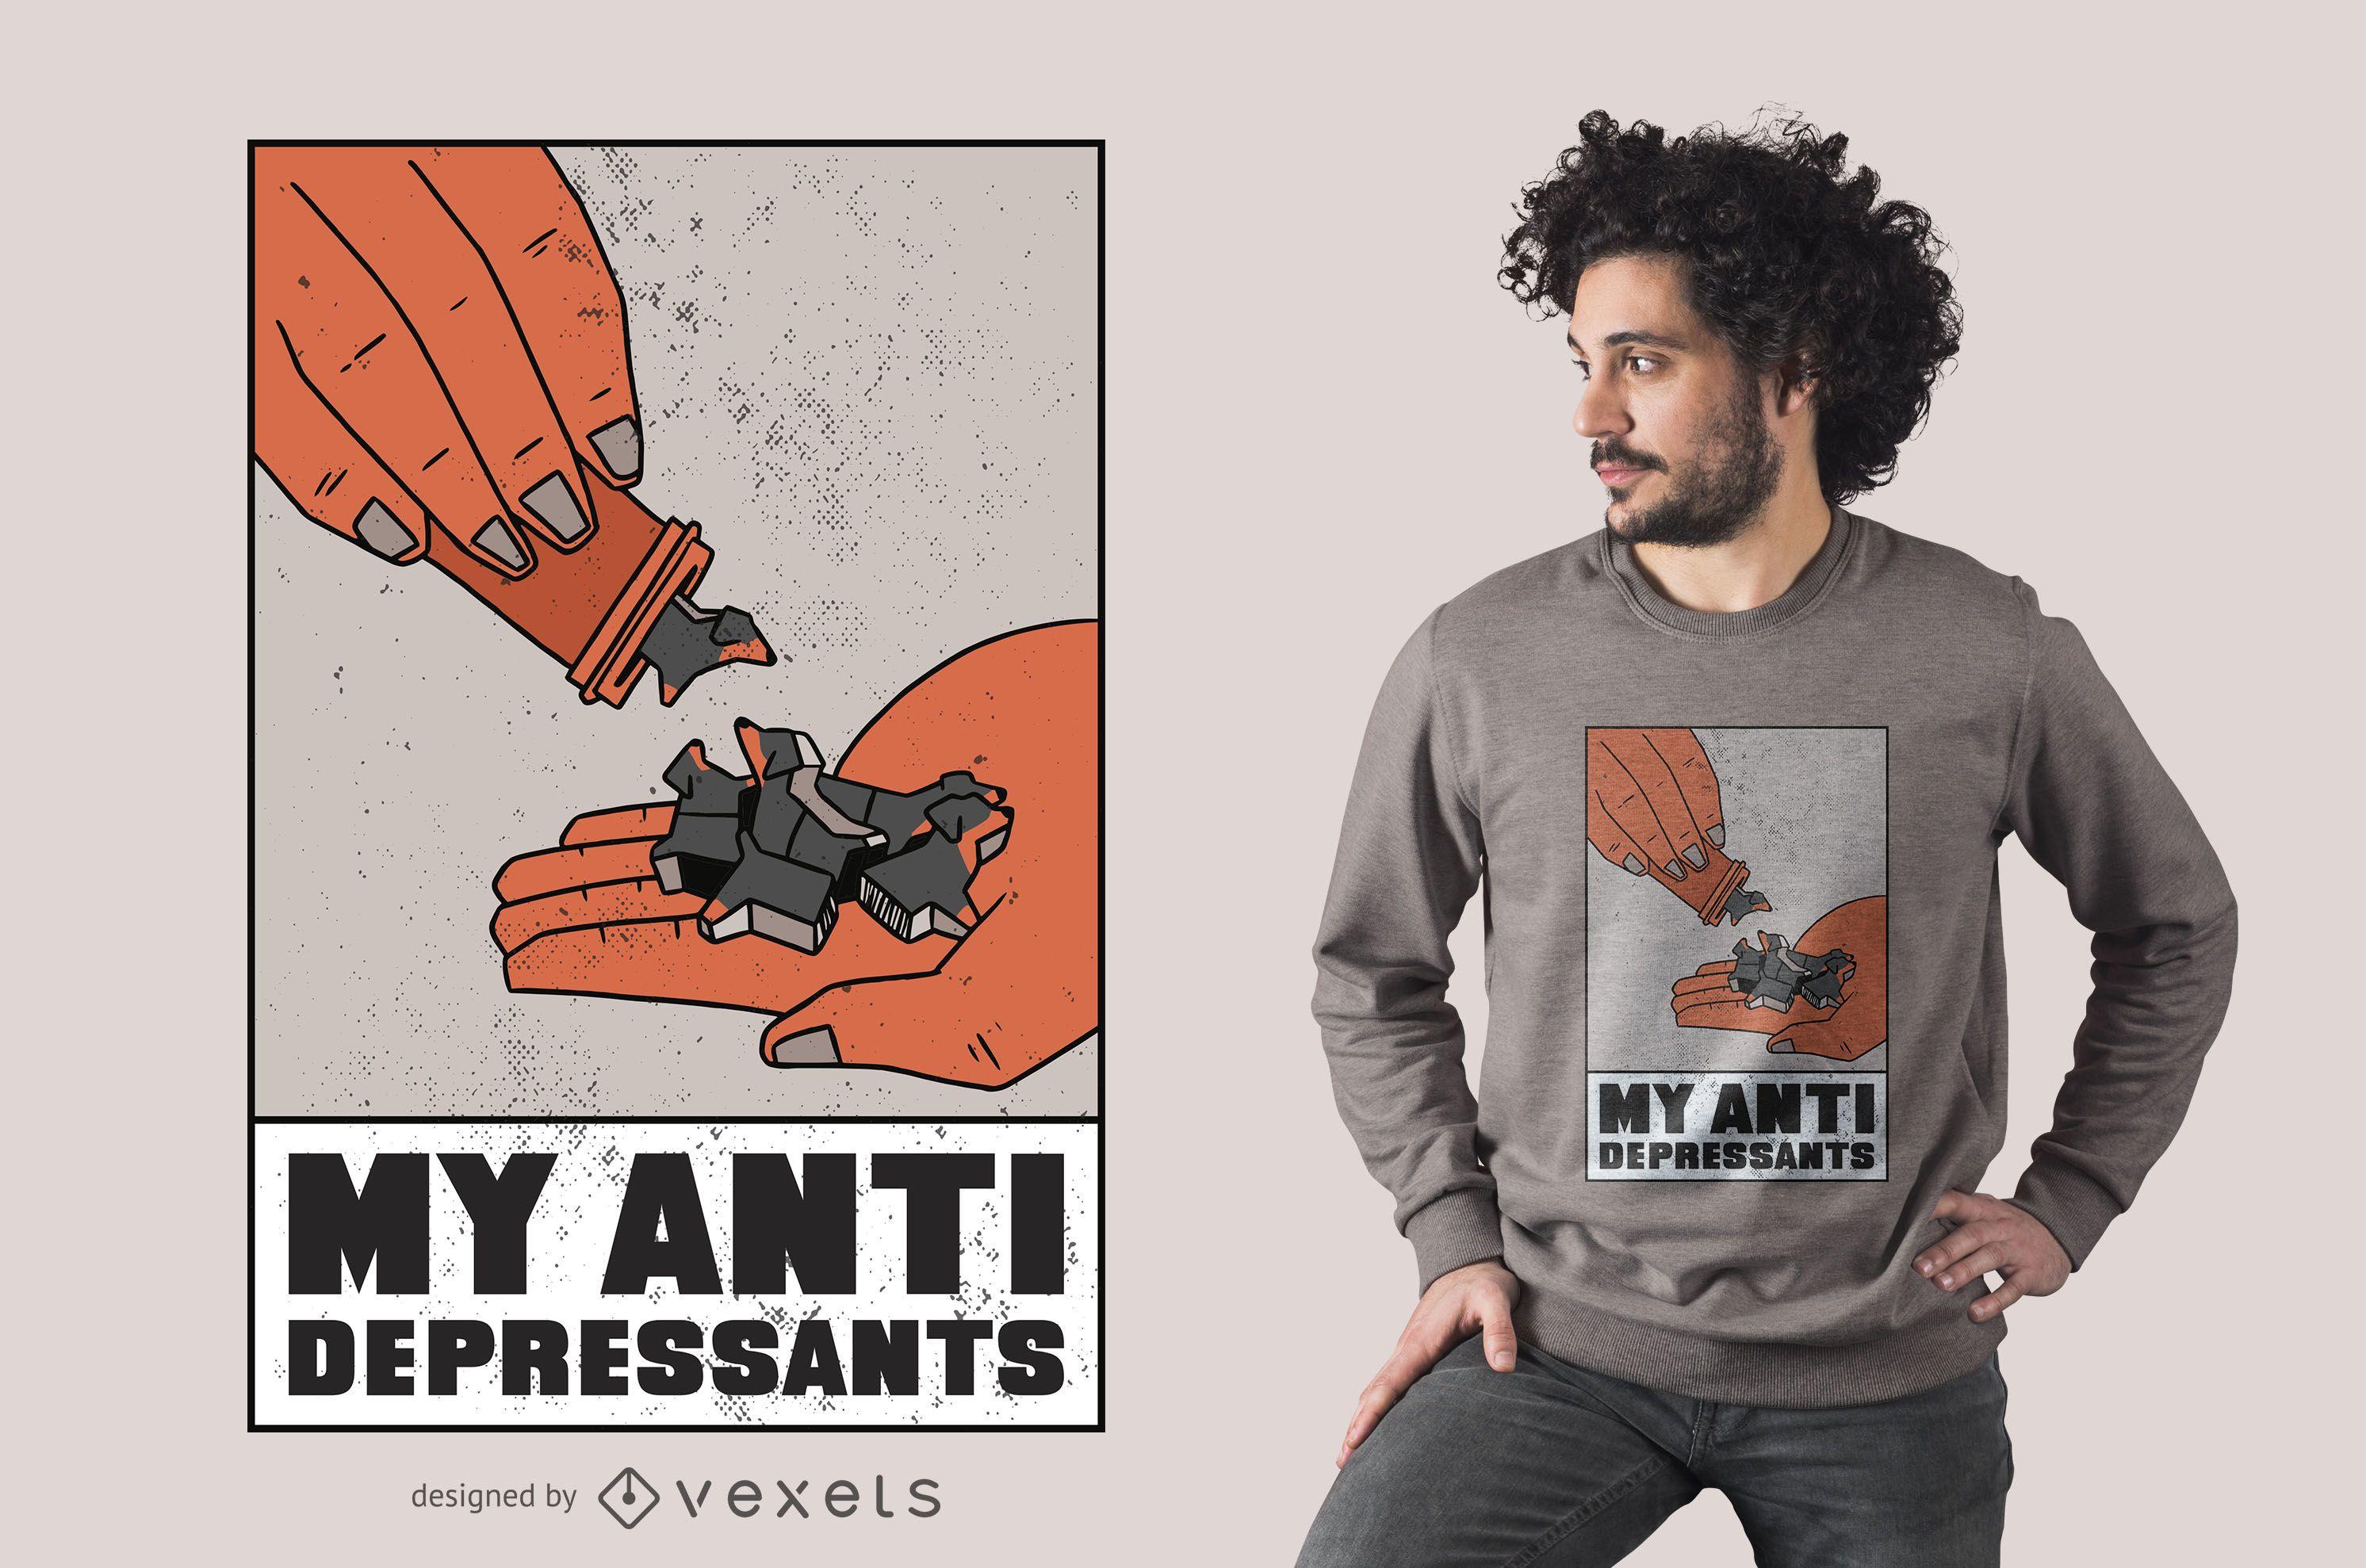 My antidepressants t-shirt design